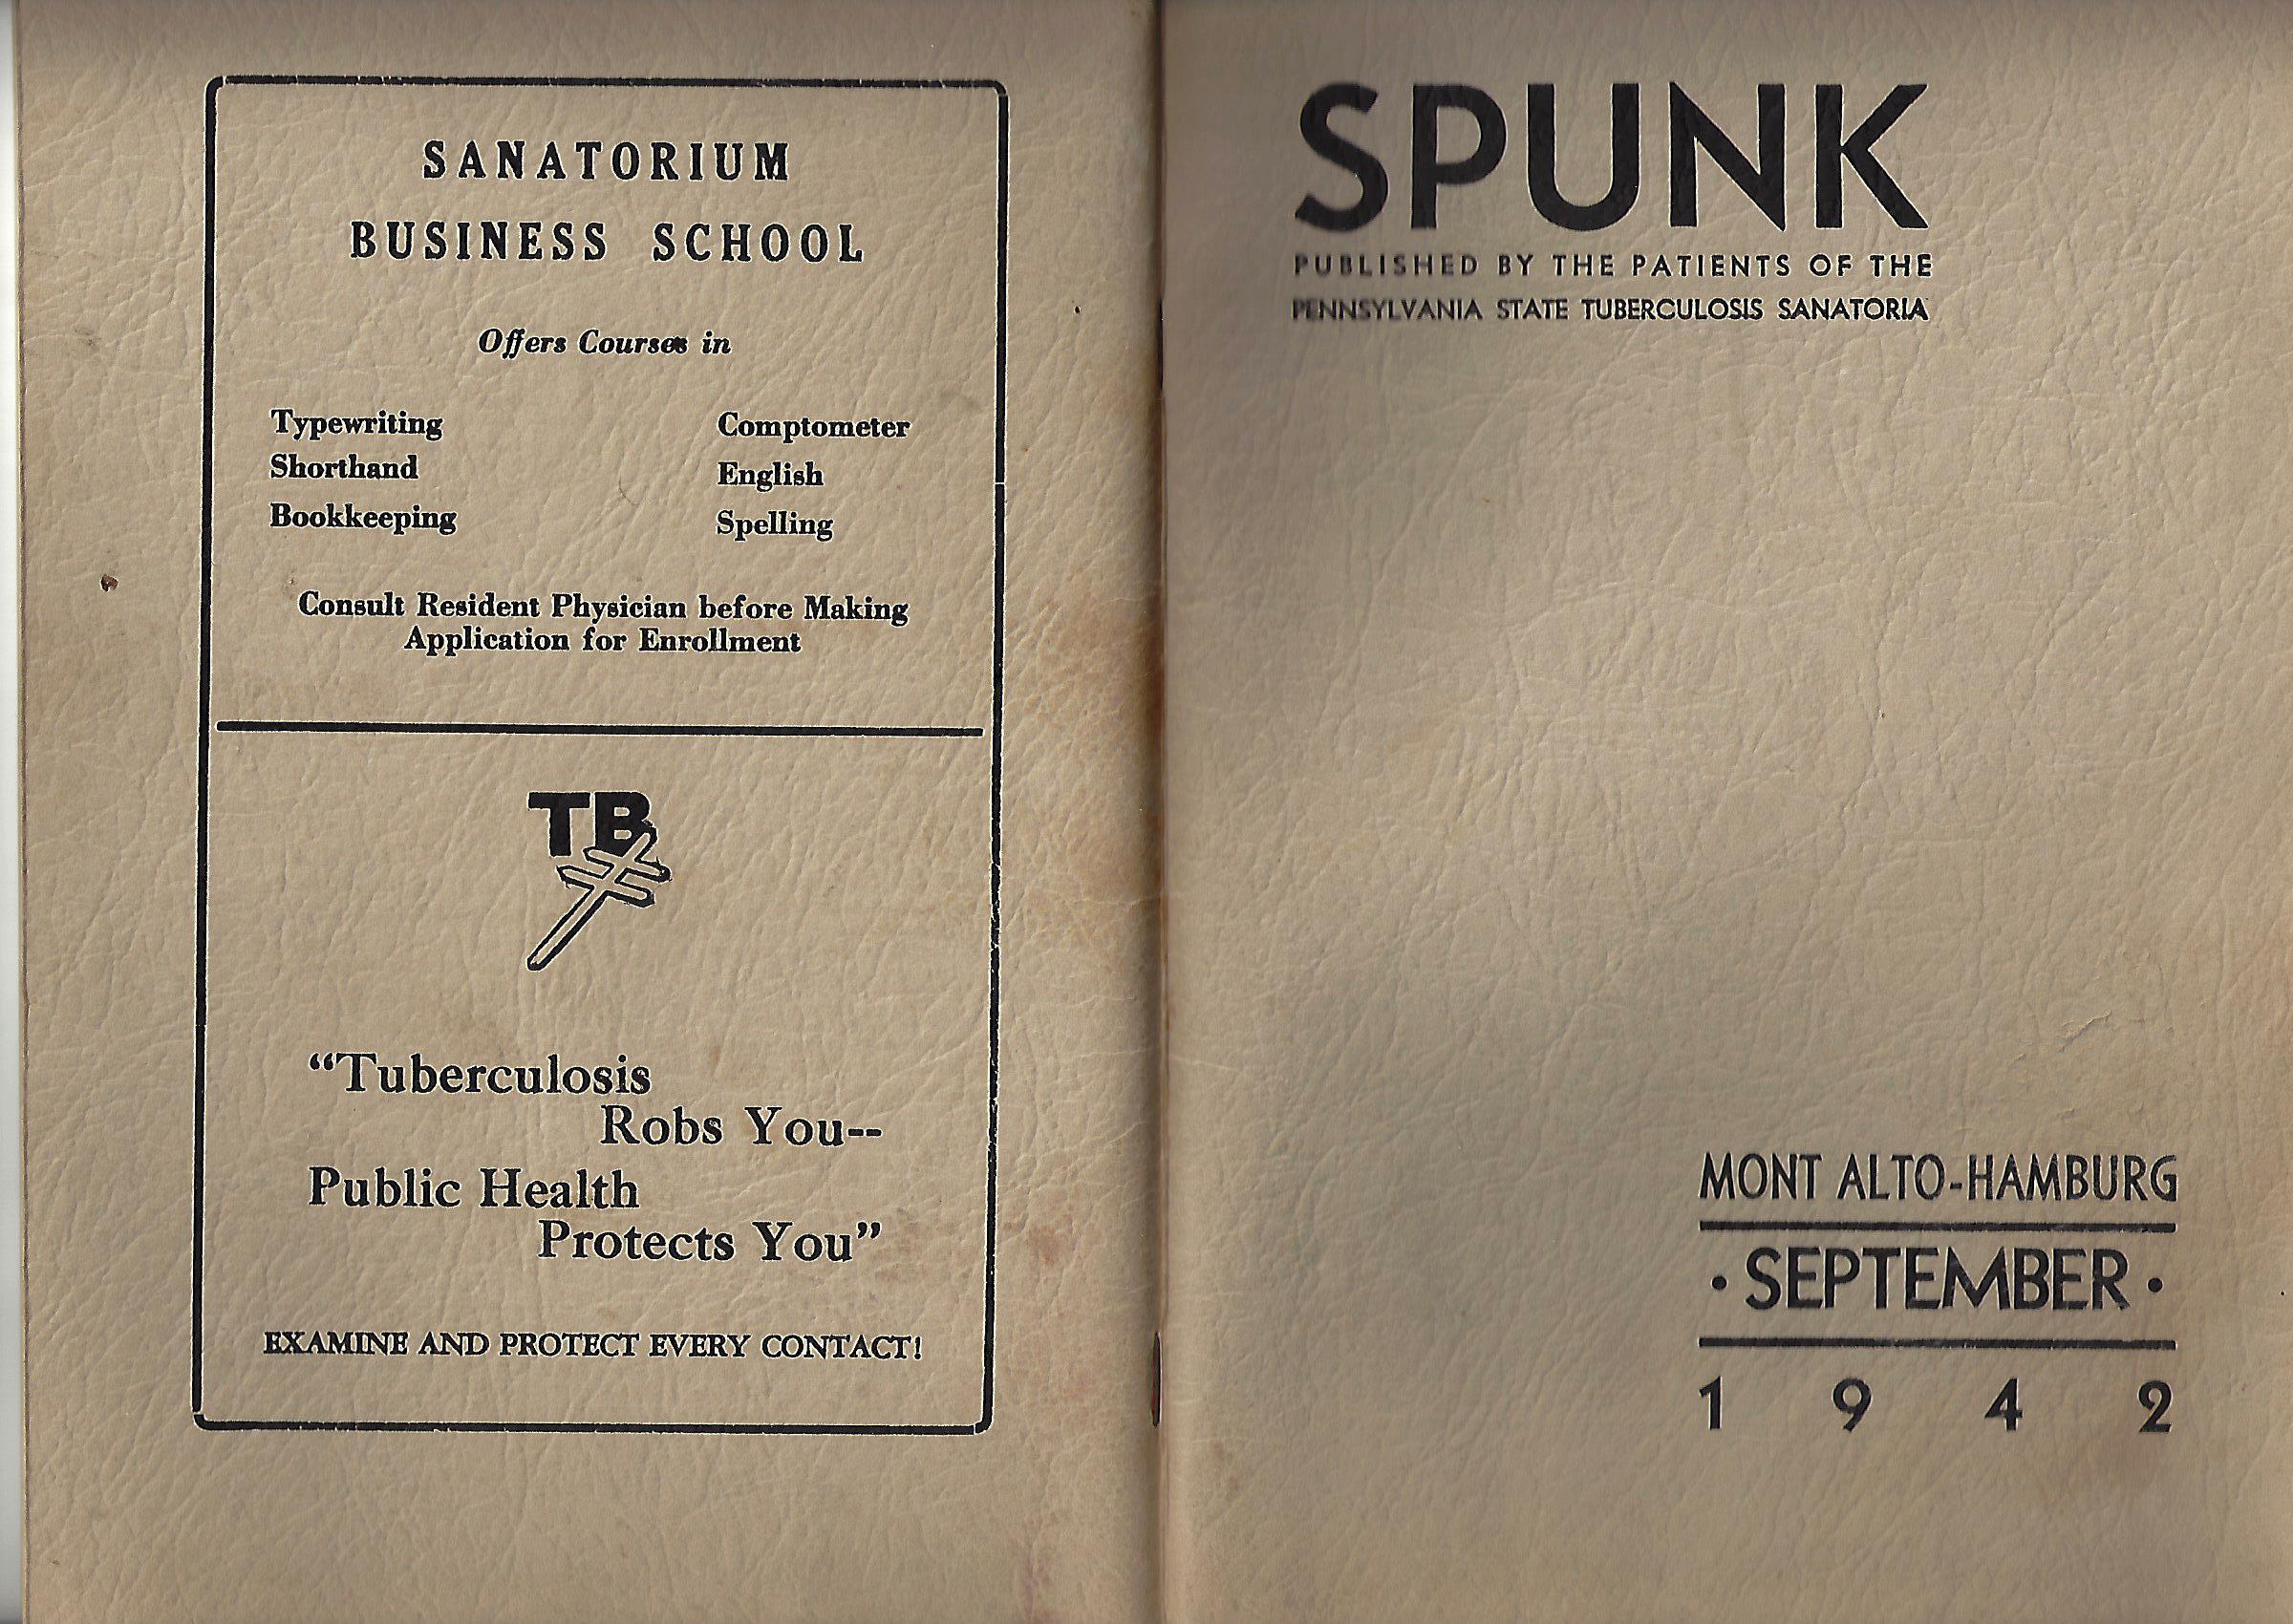 4  Spunk 1942 September